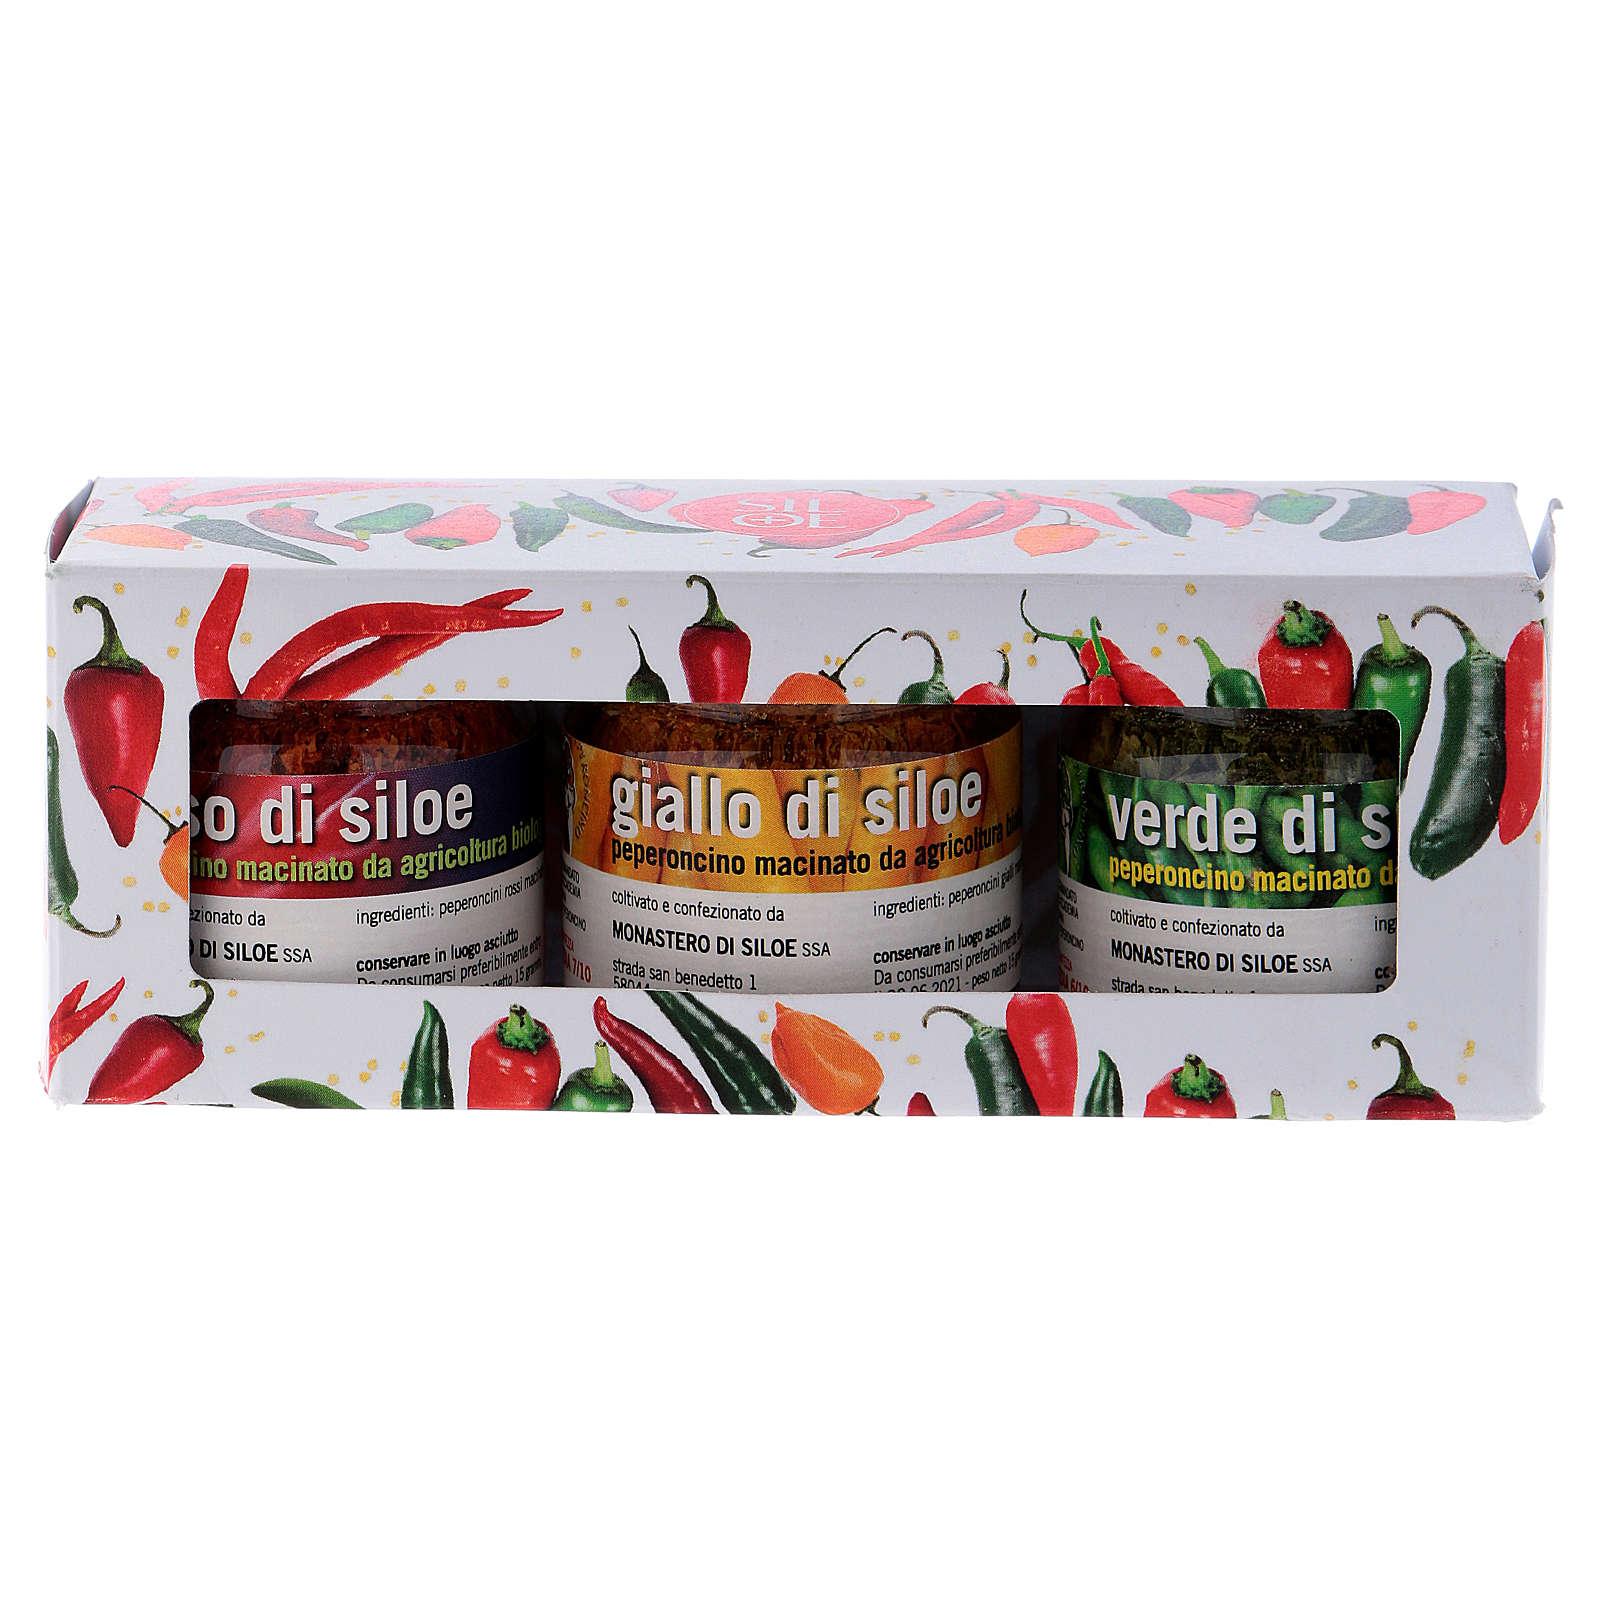 Hot pepper gift package- Monastery of Siloe 3